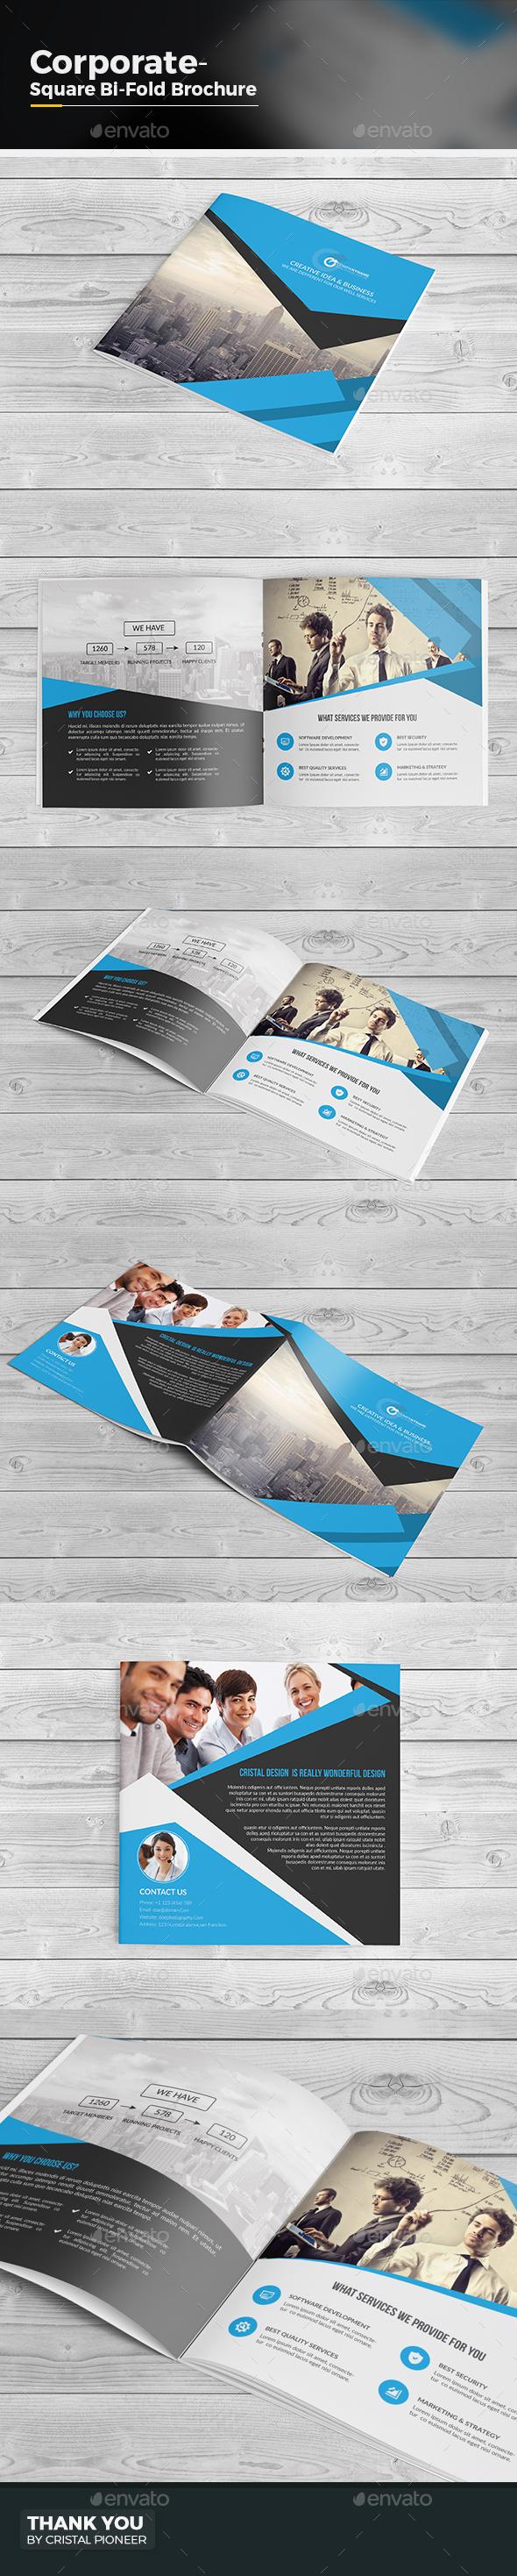 Square Bi Fold Brochure Template - Corporate Brochures